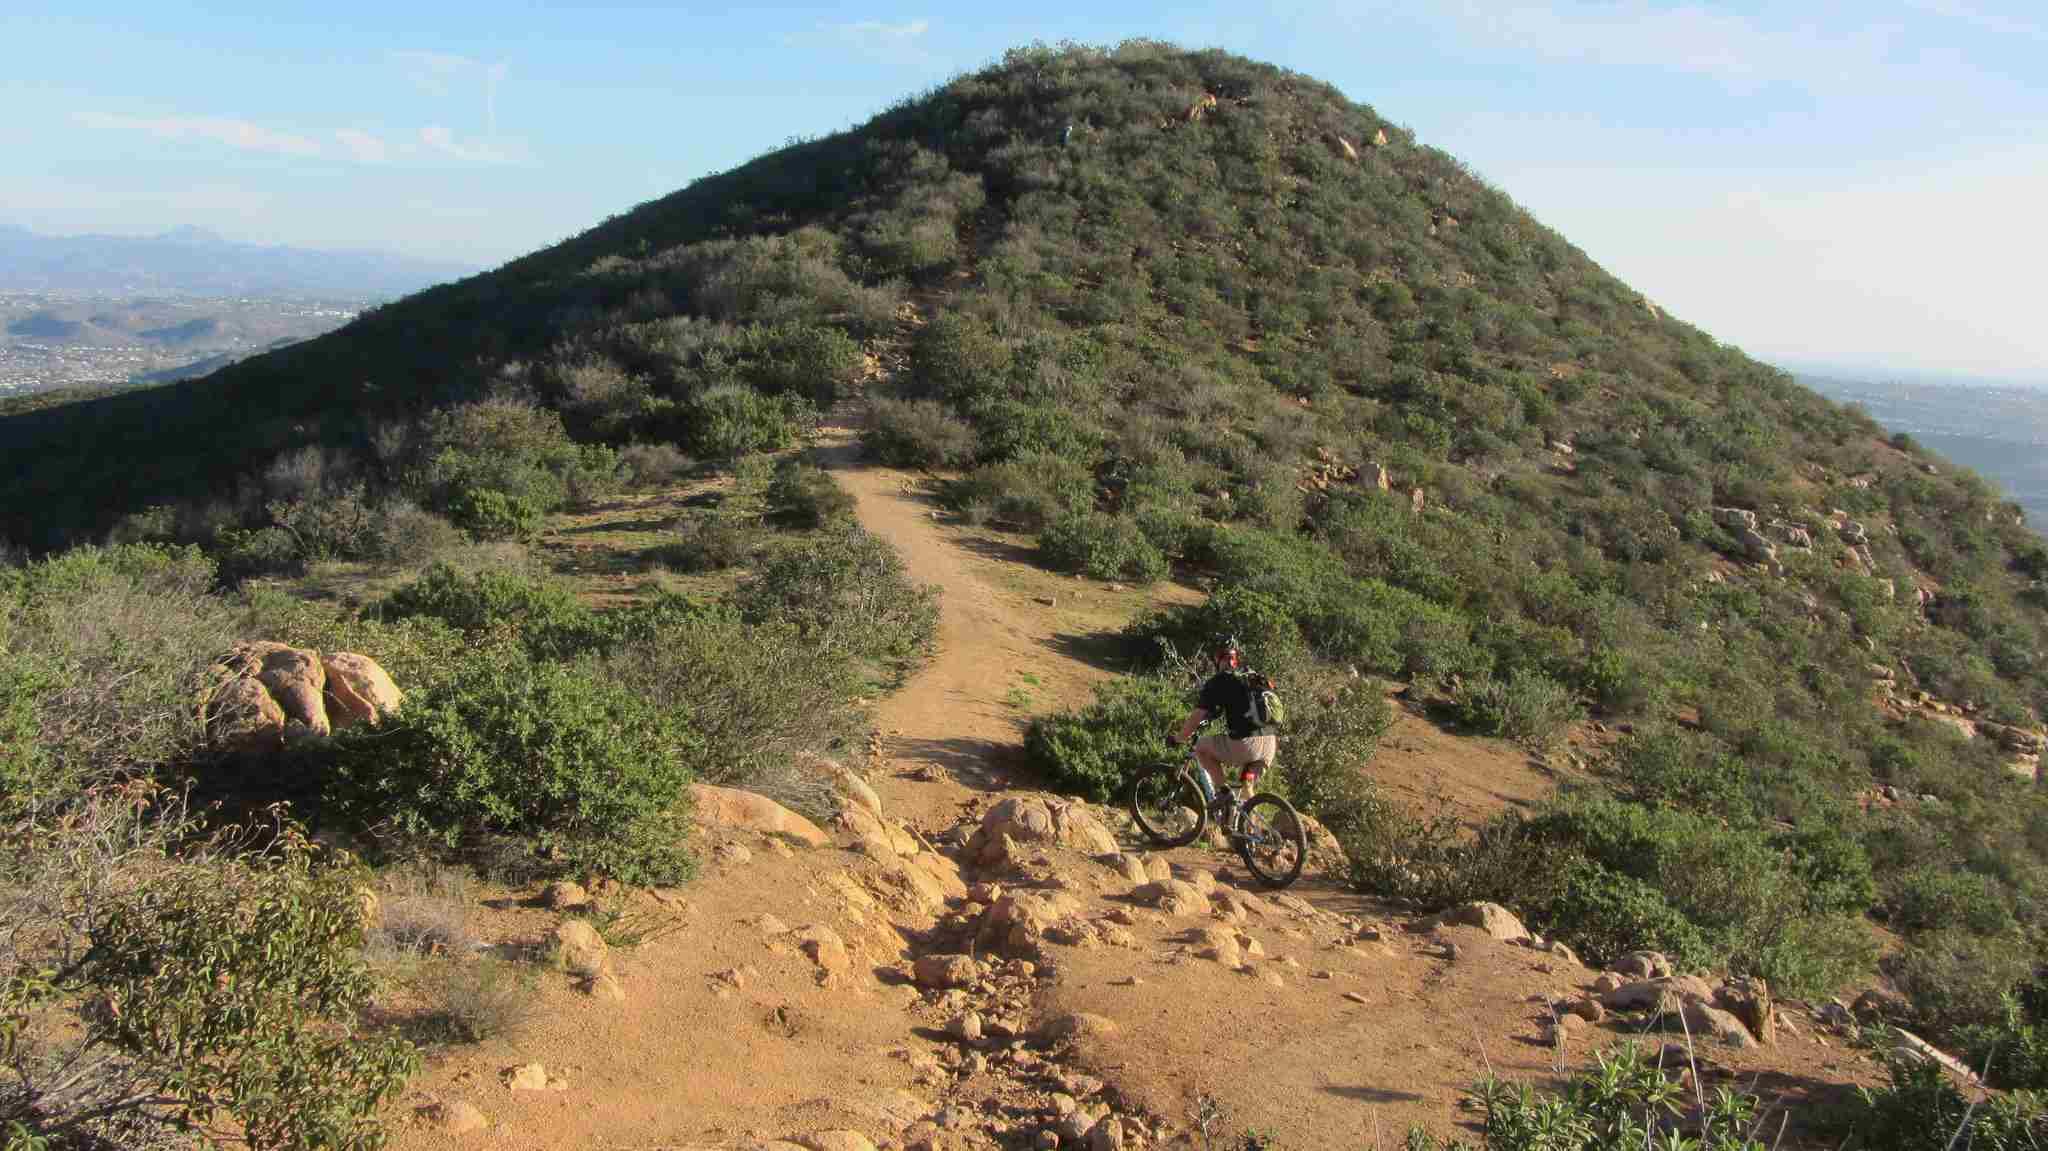 Mountain biker climbs up towards North Fortuna peak, Mission Trails Regional Park